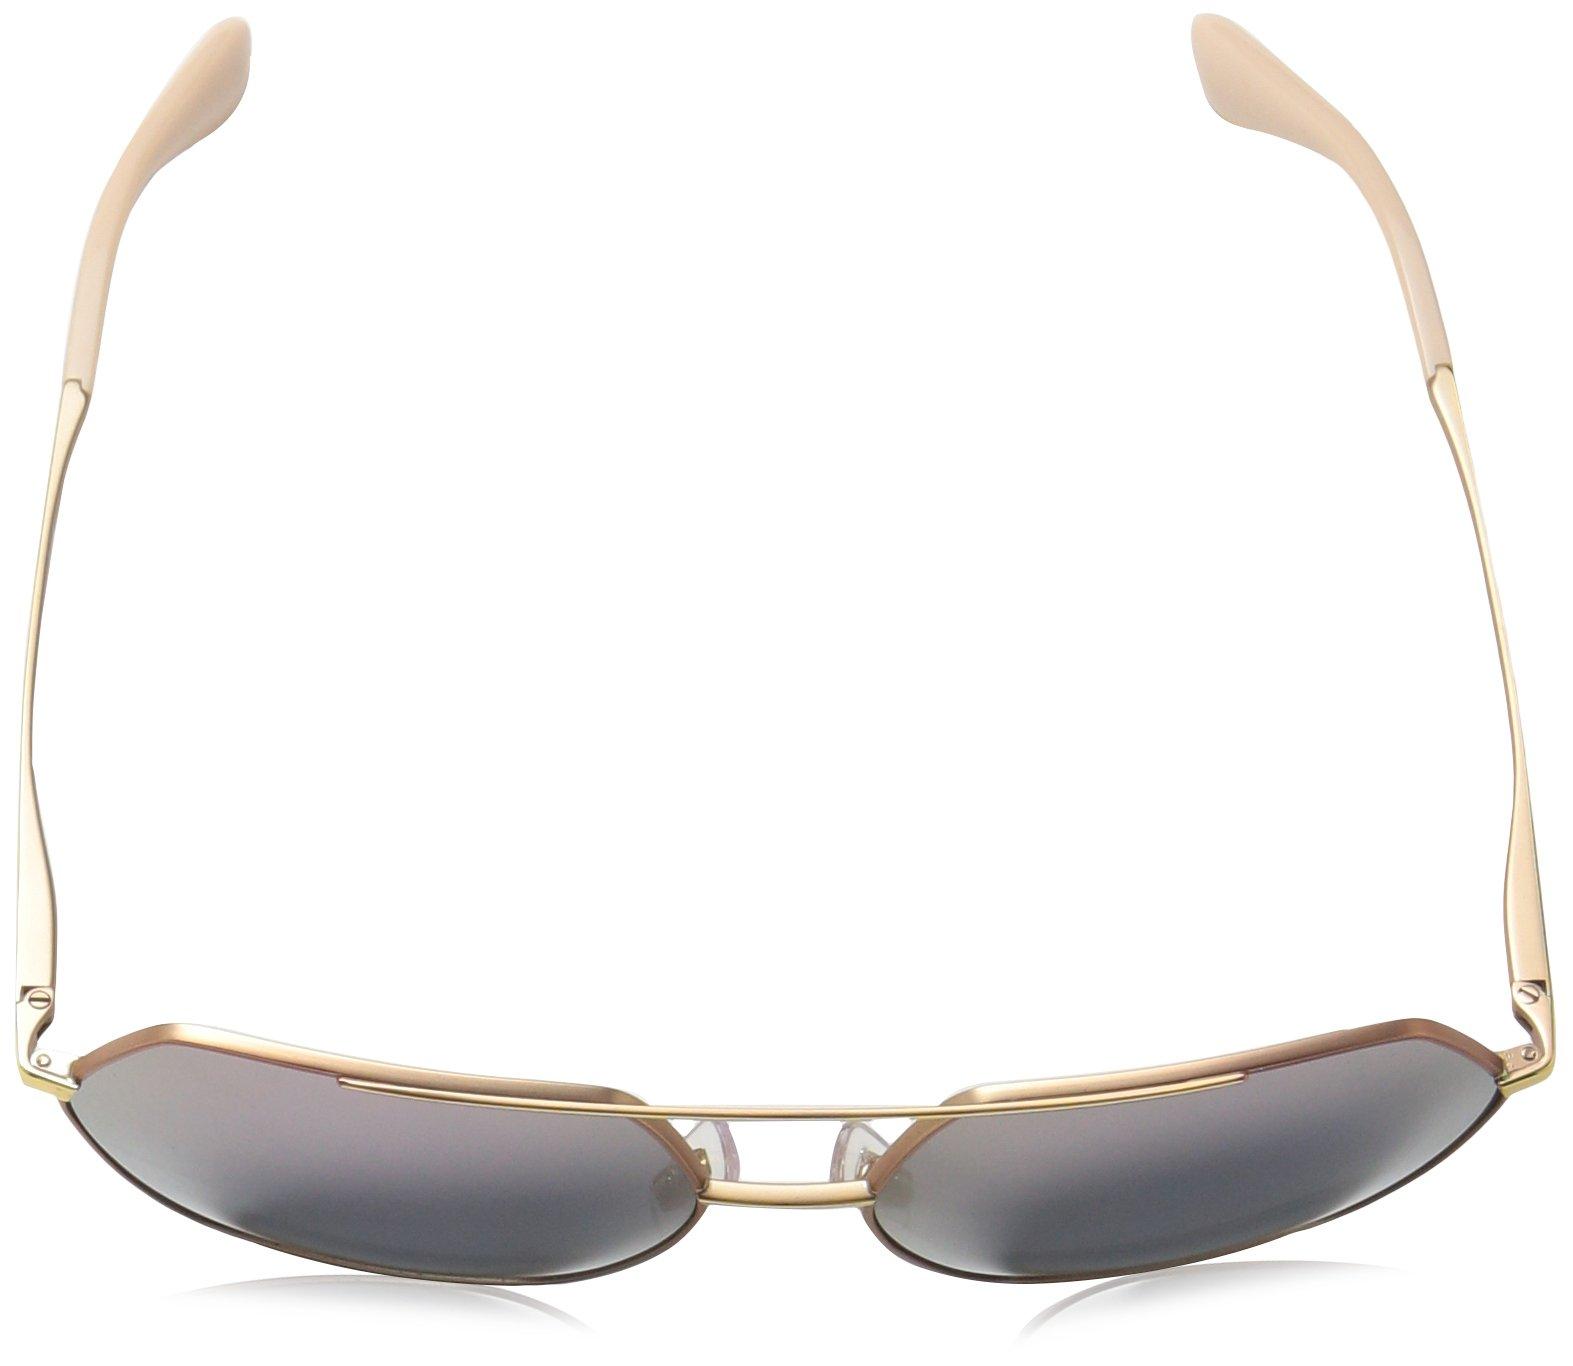 Dolce & Gabbana Women's Metal Woman Non-Polarized Iridium Square Sunglasses, Matte Pink Gold, 59.2 mm by Dolce & Gabbana (Image #4)